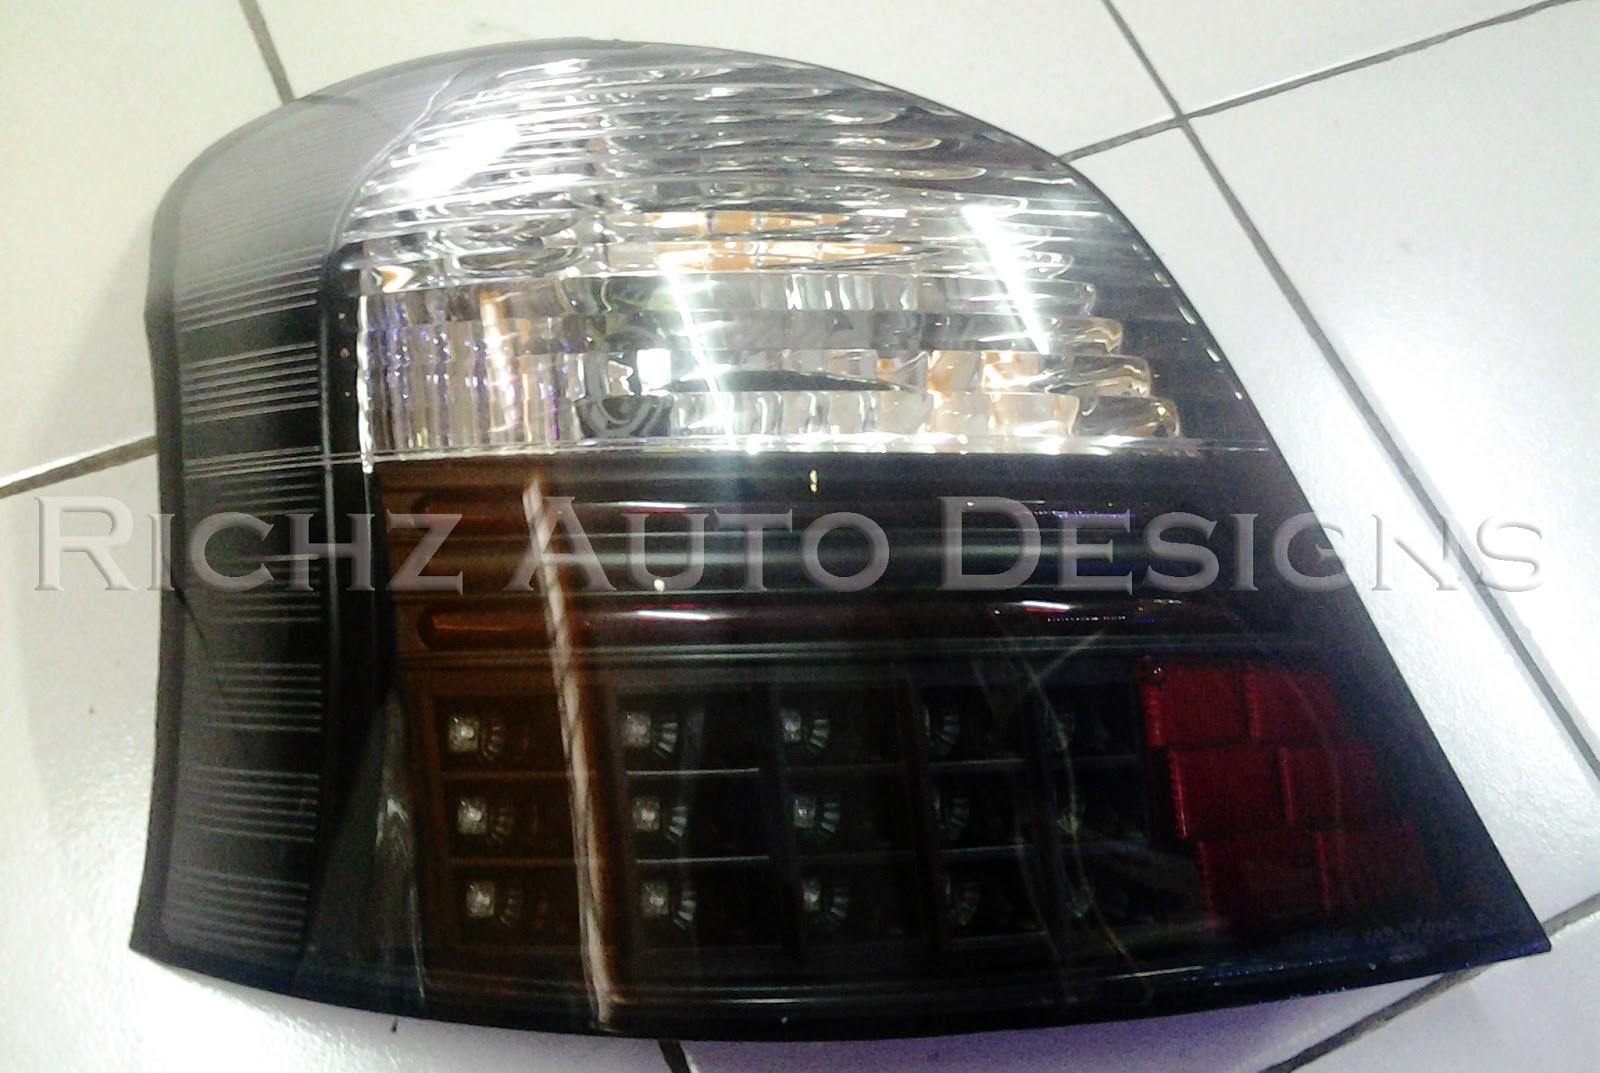 Headlamp Grand New Avanza Kapasitas Oli Mesin Veloz Richz Auto Designs: / Stoplamp Led